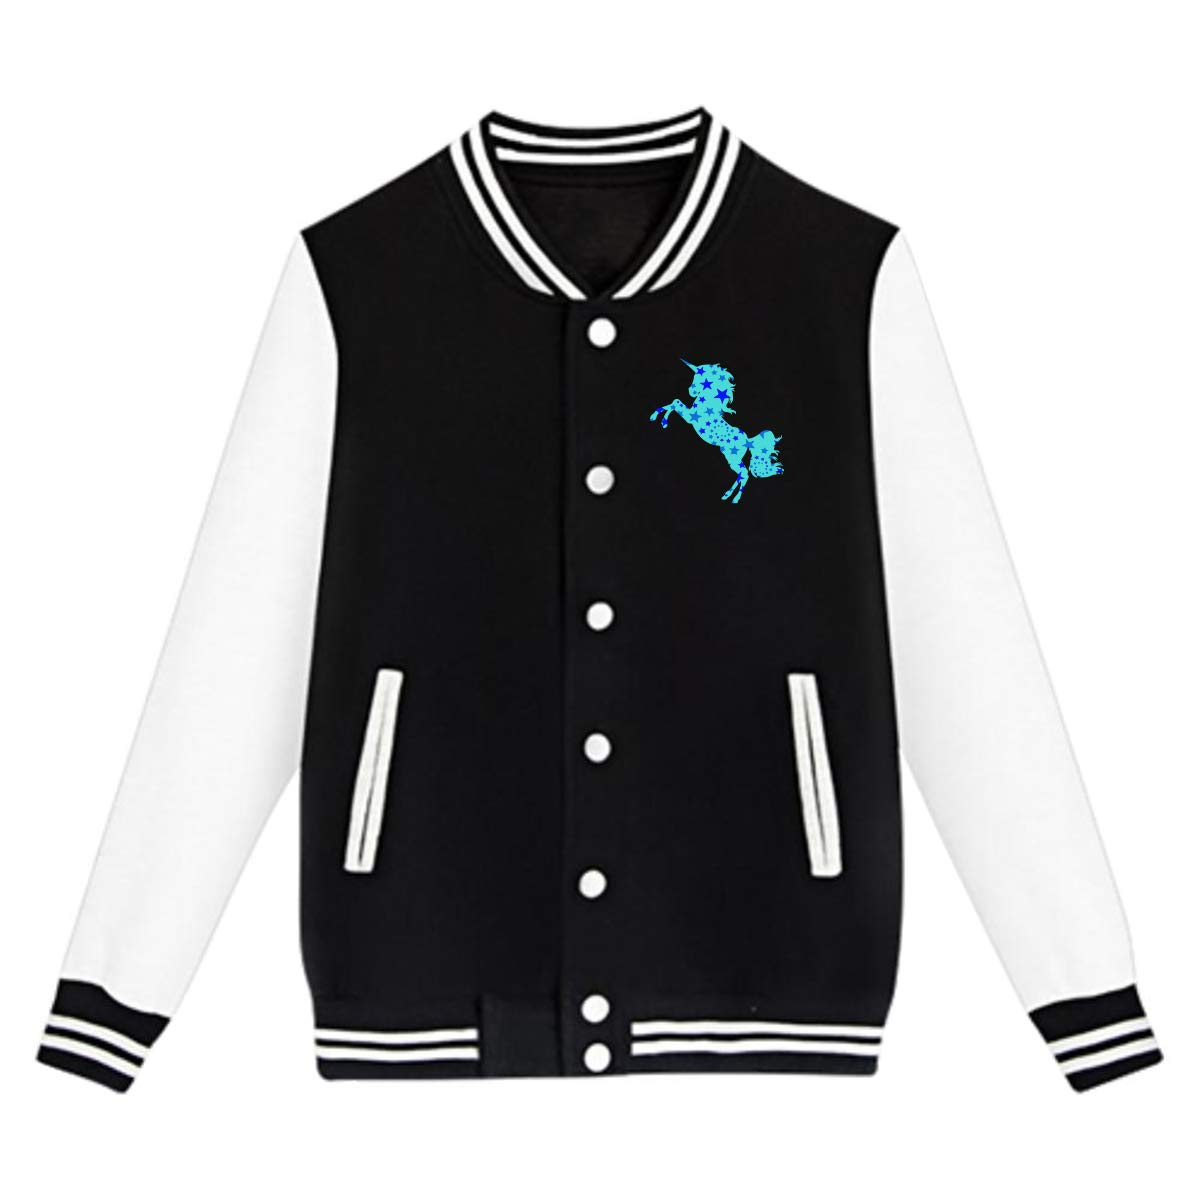 Unisex Teen Baseball Uniform Jacket Galaxy Unicorn Sweater Sport Coat